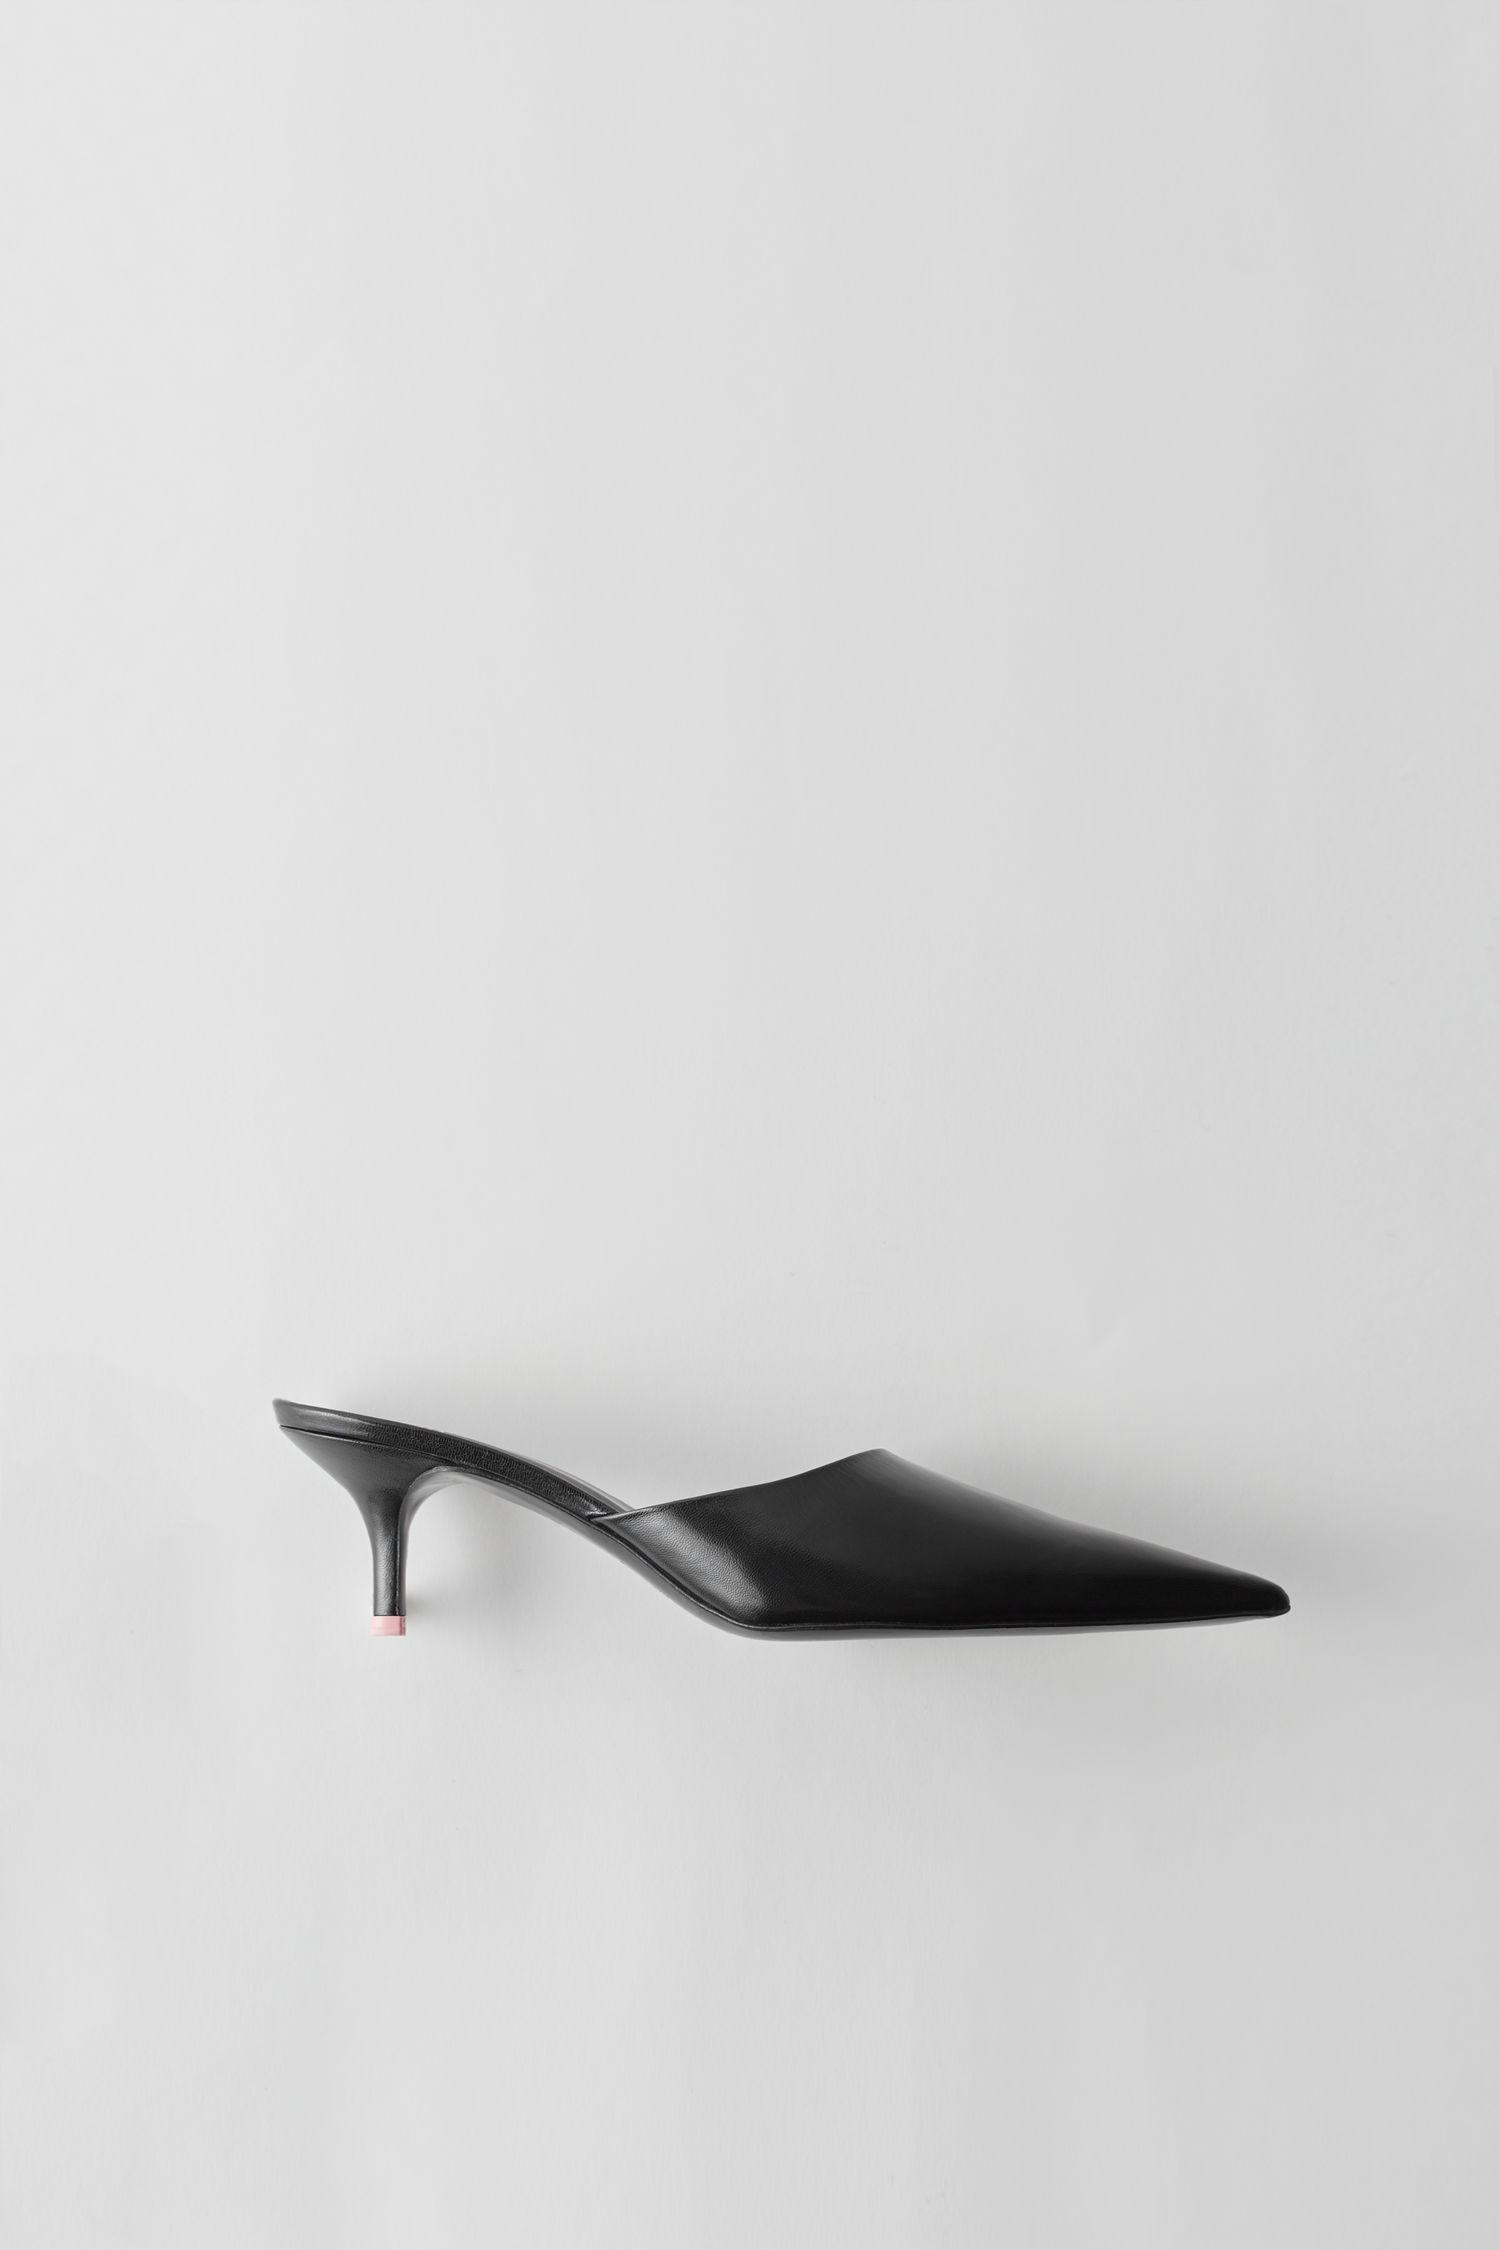 6681ae8fa2c Acne Studios Fn-wn-shoe000055 Black Pointed Toe Mule in Black - Lyst